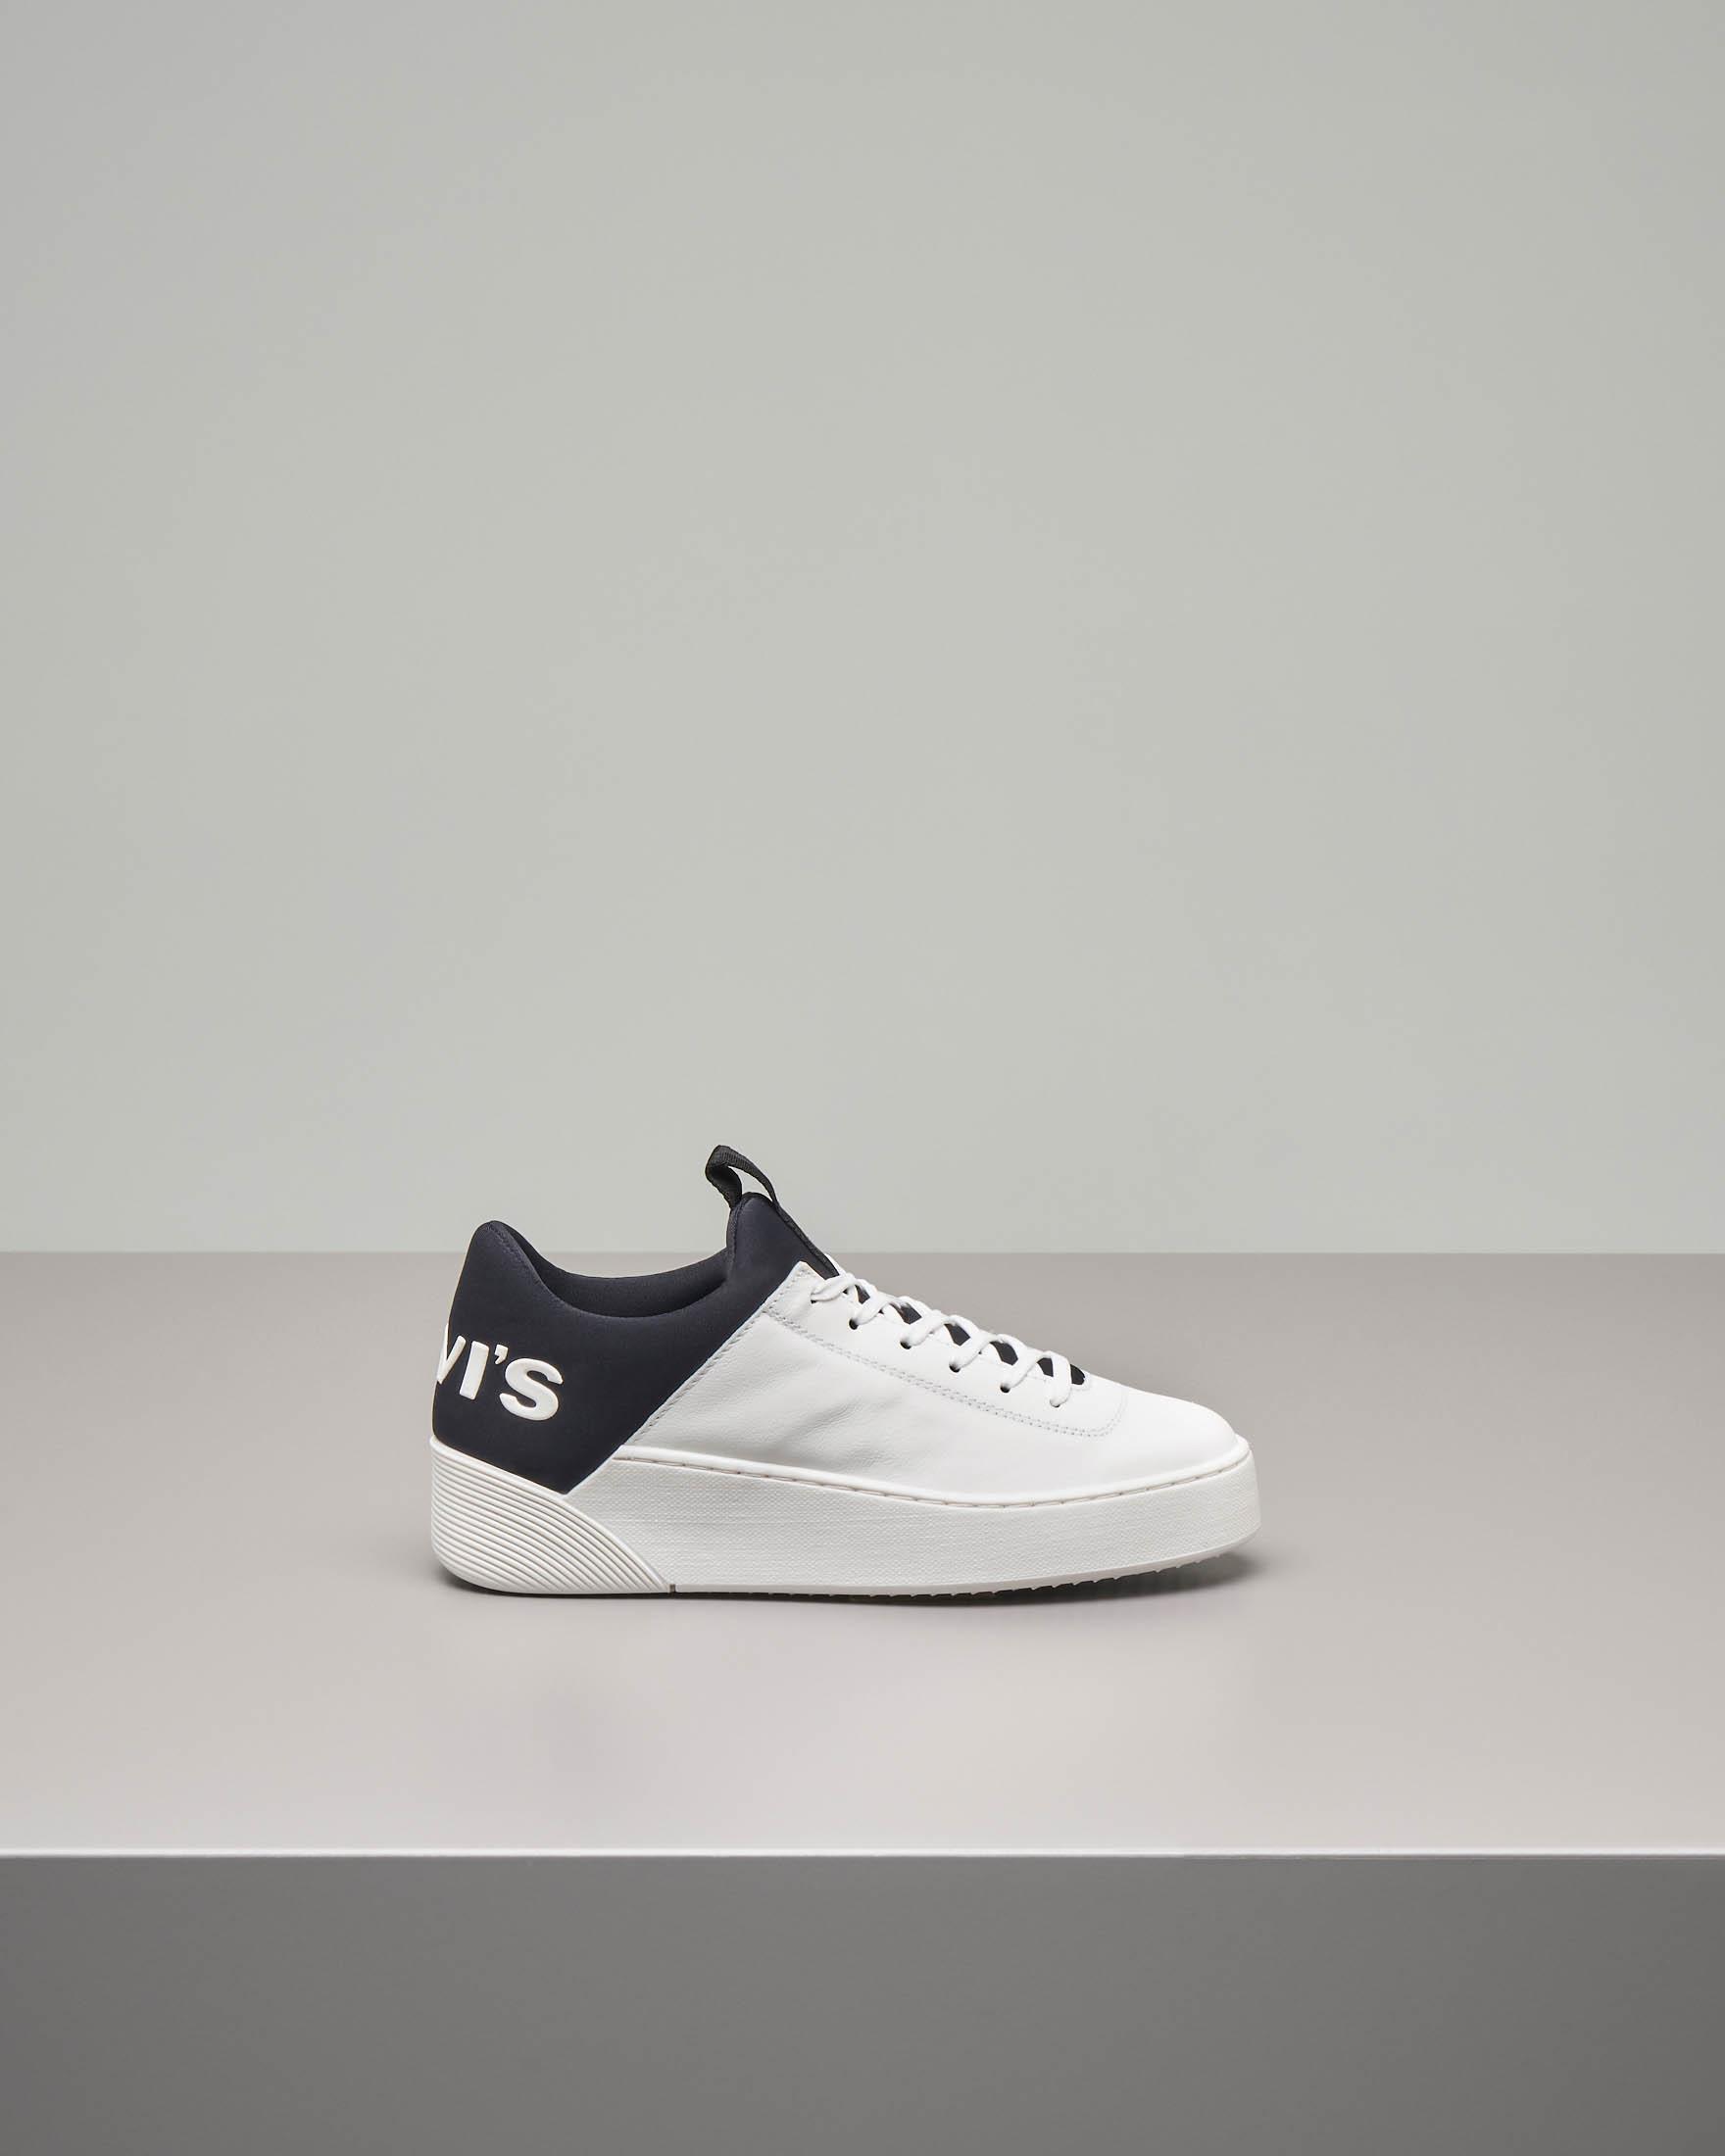 Sneaker Levi's Mullet bianche con logo oversized blu